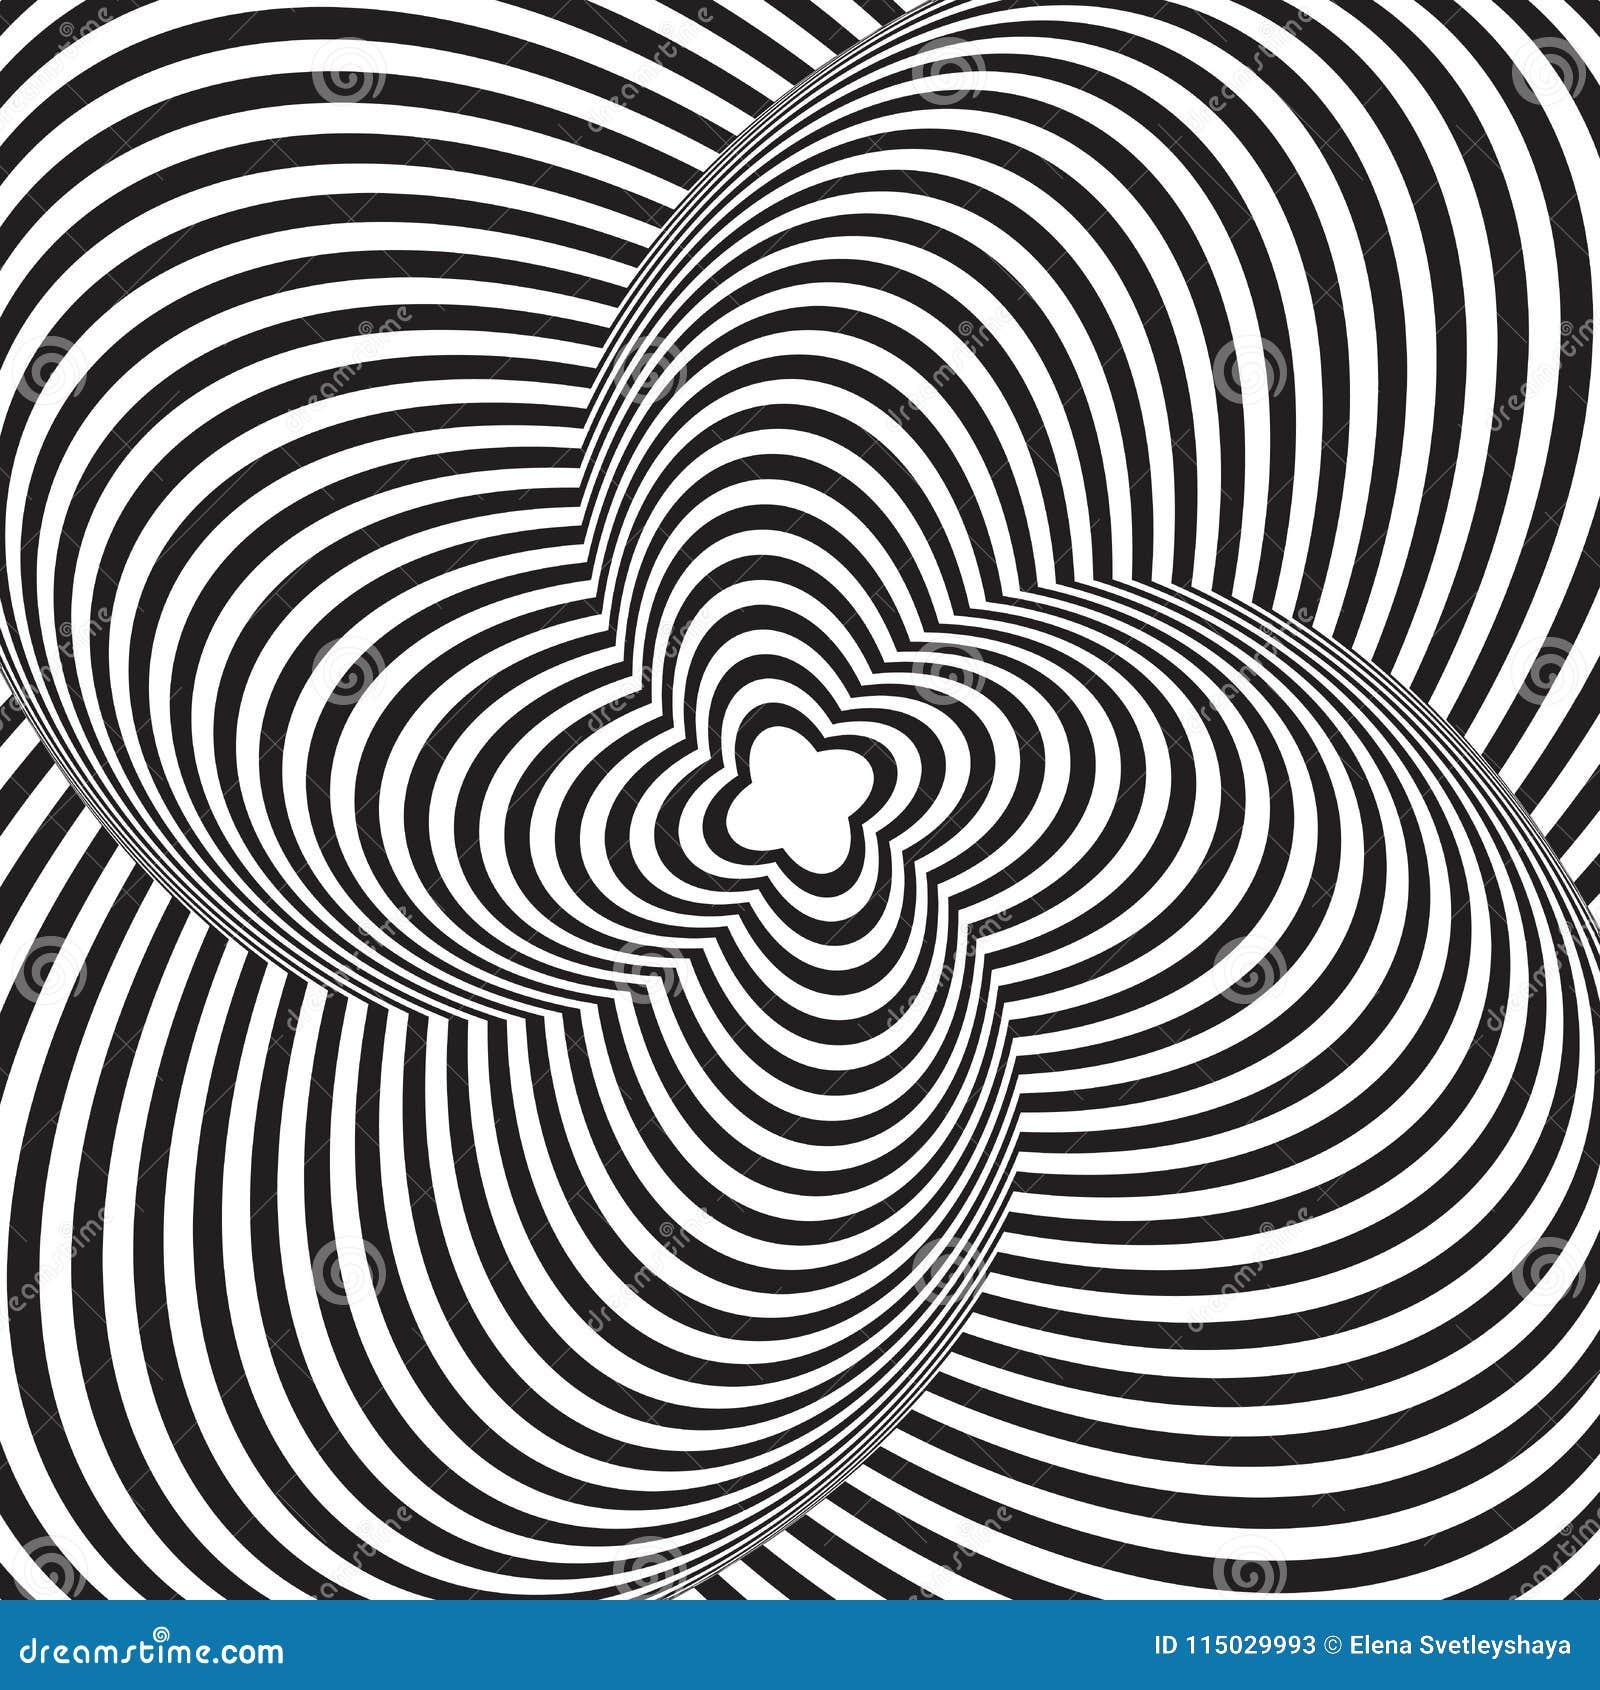 optical art illusion d background modern geometric monochrome vector pattern design wallpaper wrapping fabric backdrop print 115029993